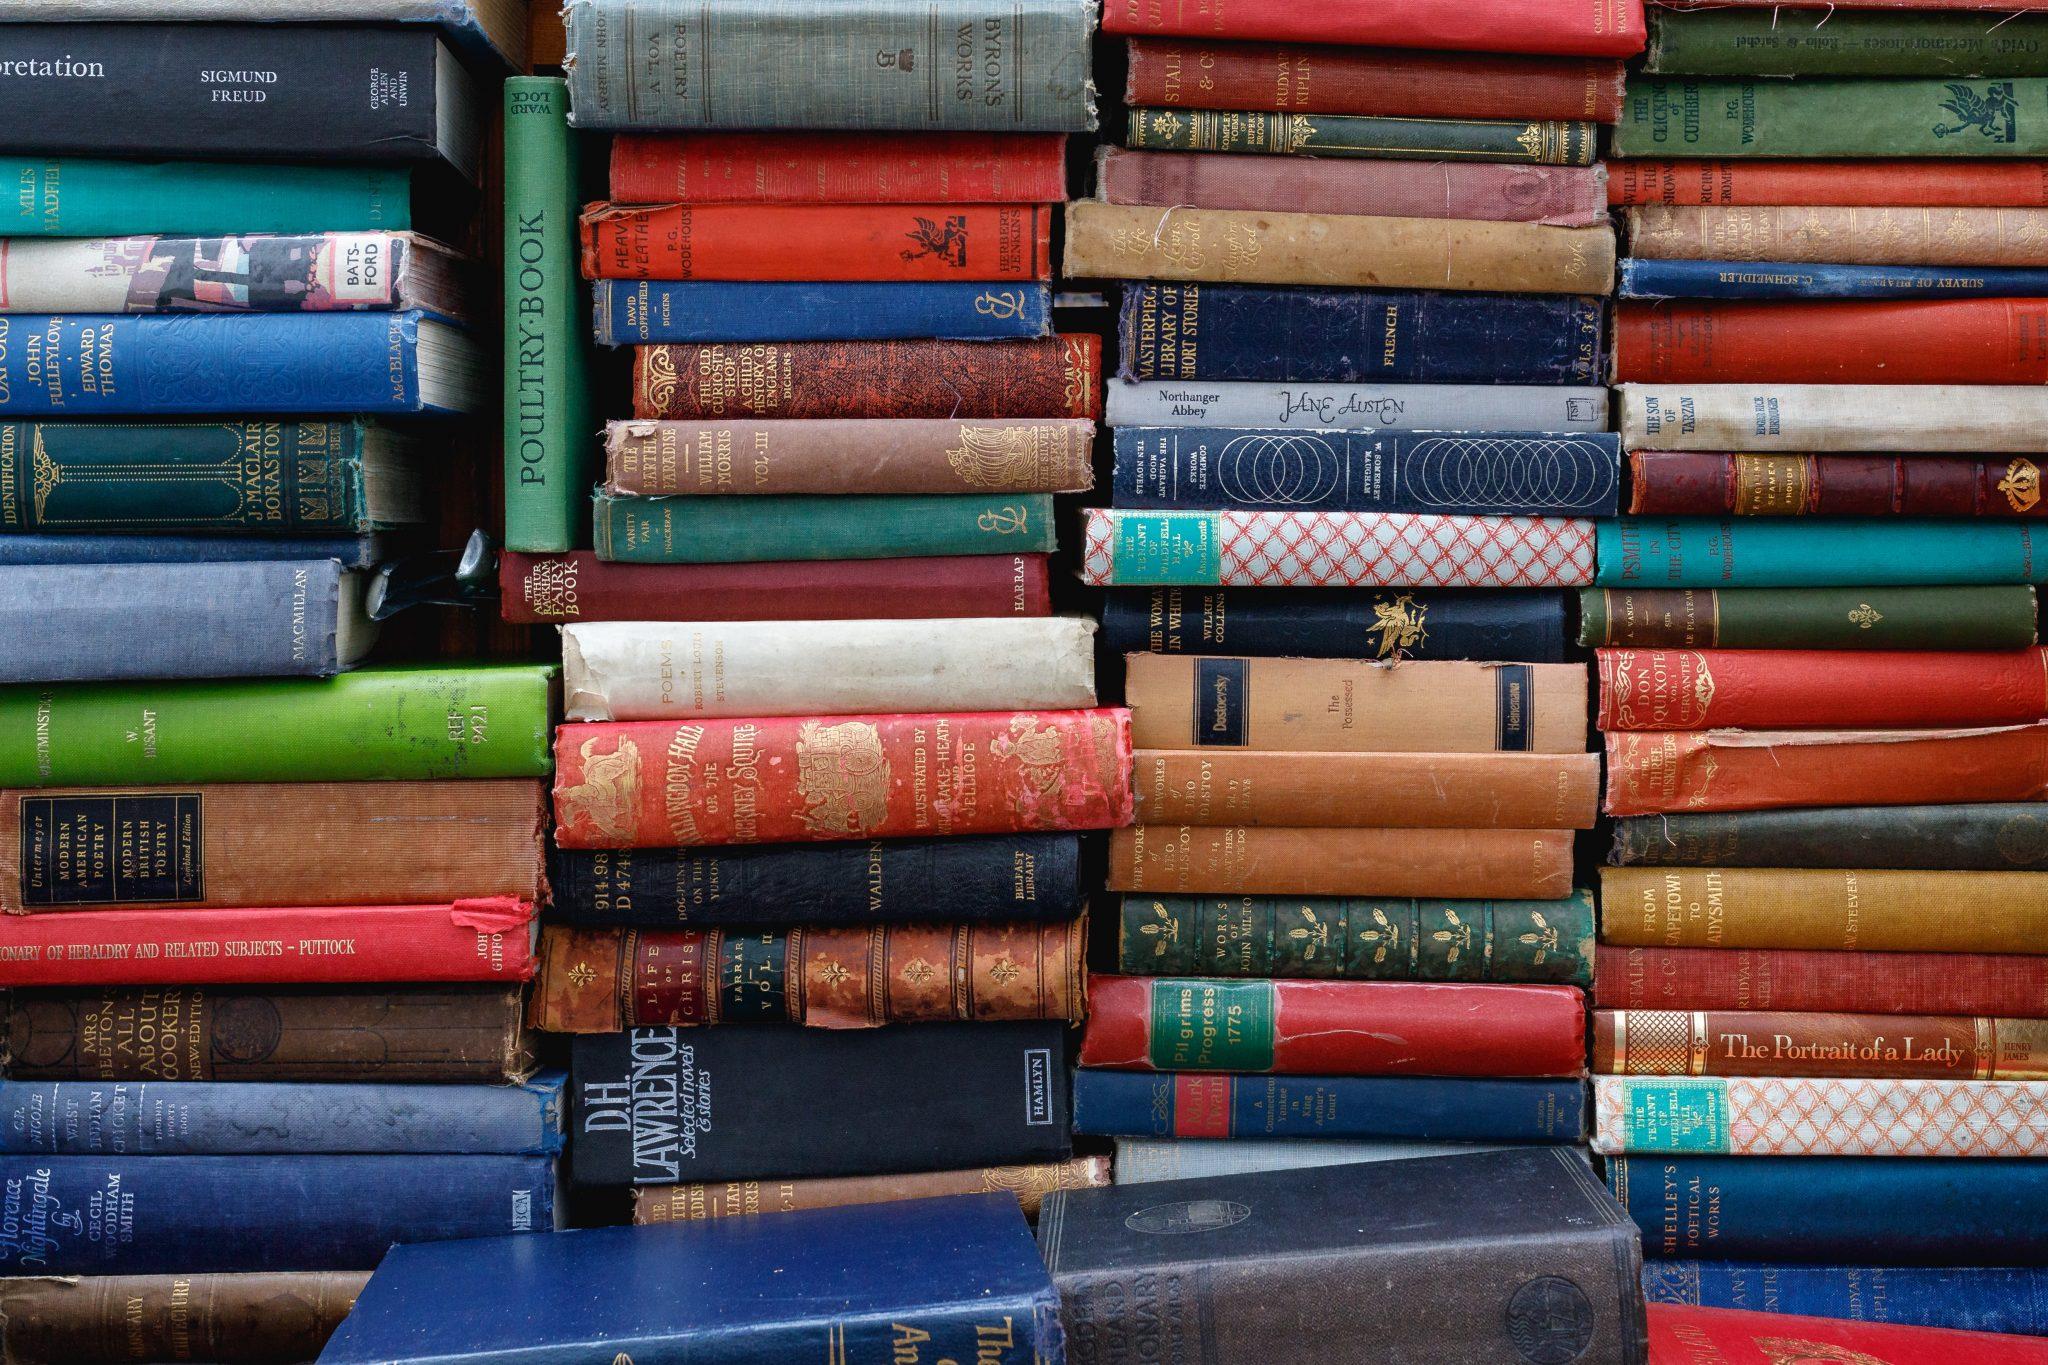 The Benefits of Lifelong Learning